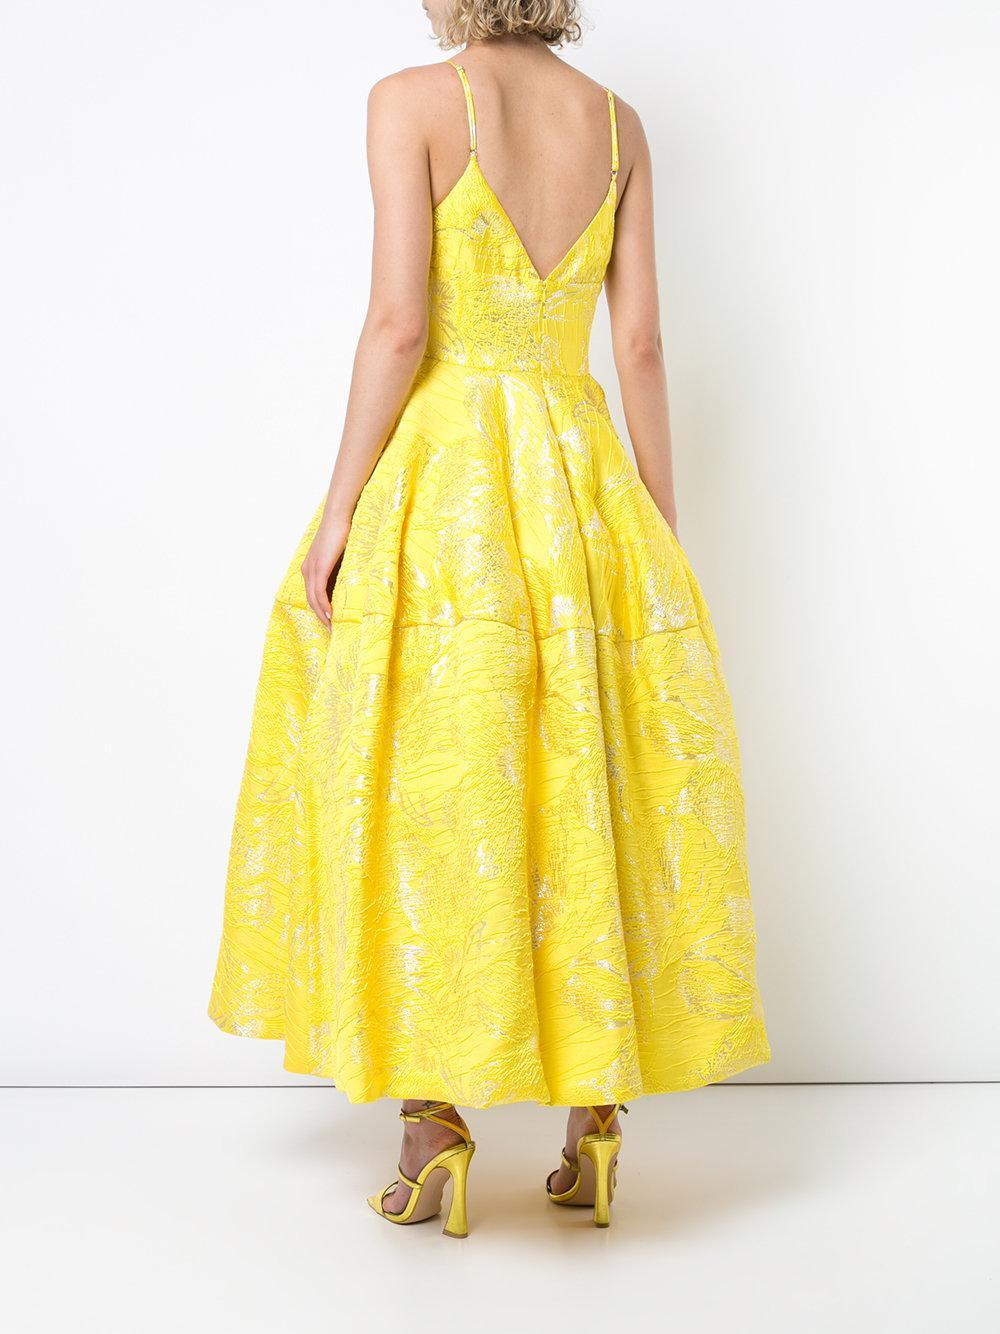 Siriano Yellow Flared Midi Dress Lyst View Fullscreen